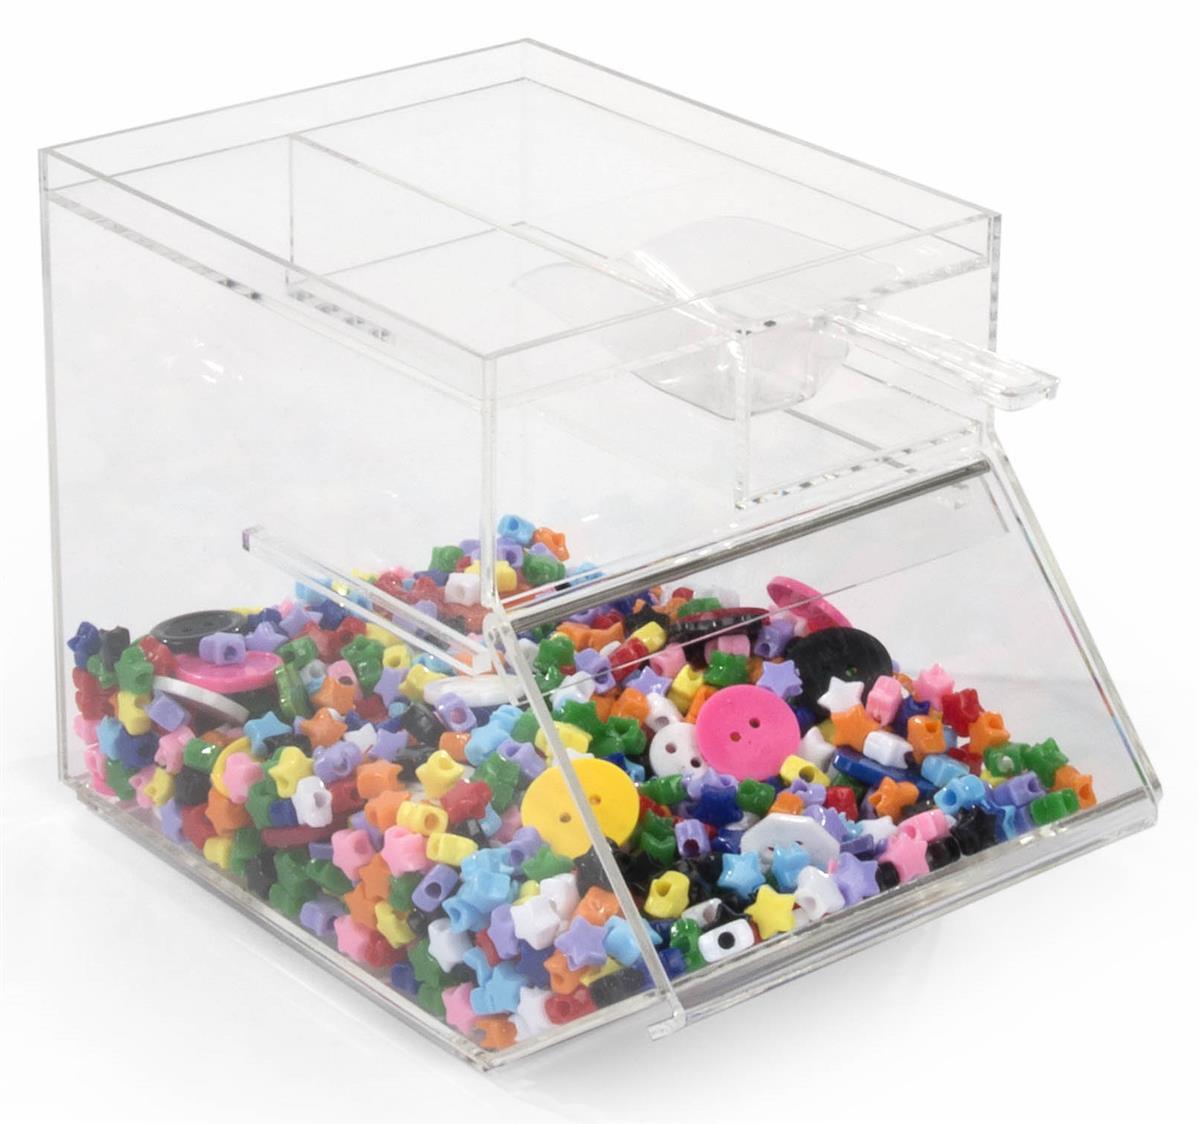 Clear Plastic Countertop Bins   Acrylic & PVC Storage Organizers